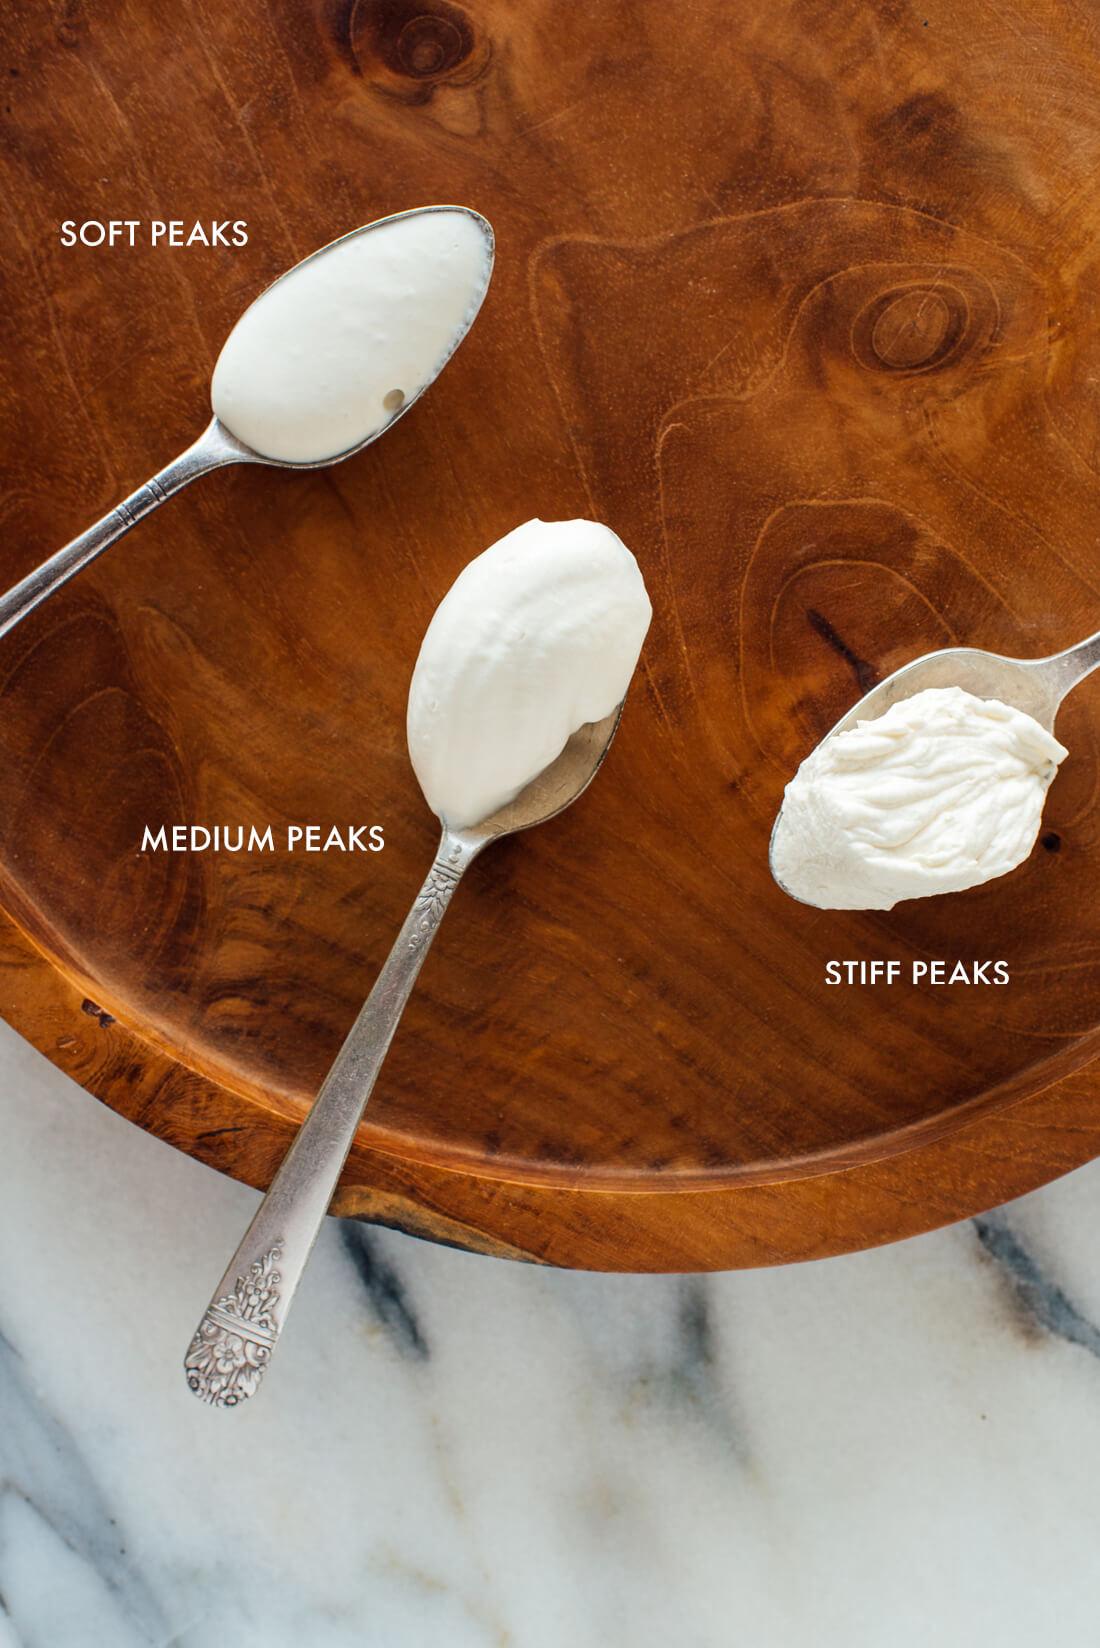 whipped cream examples of soft, medium and stiff peaks